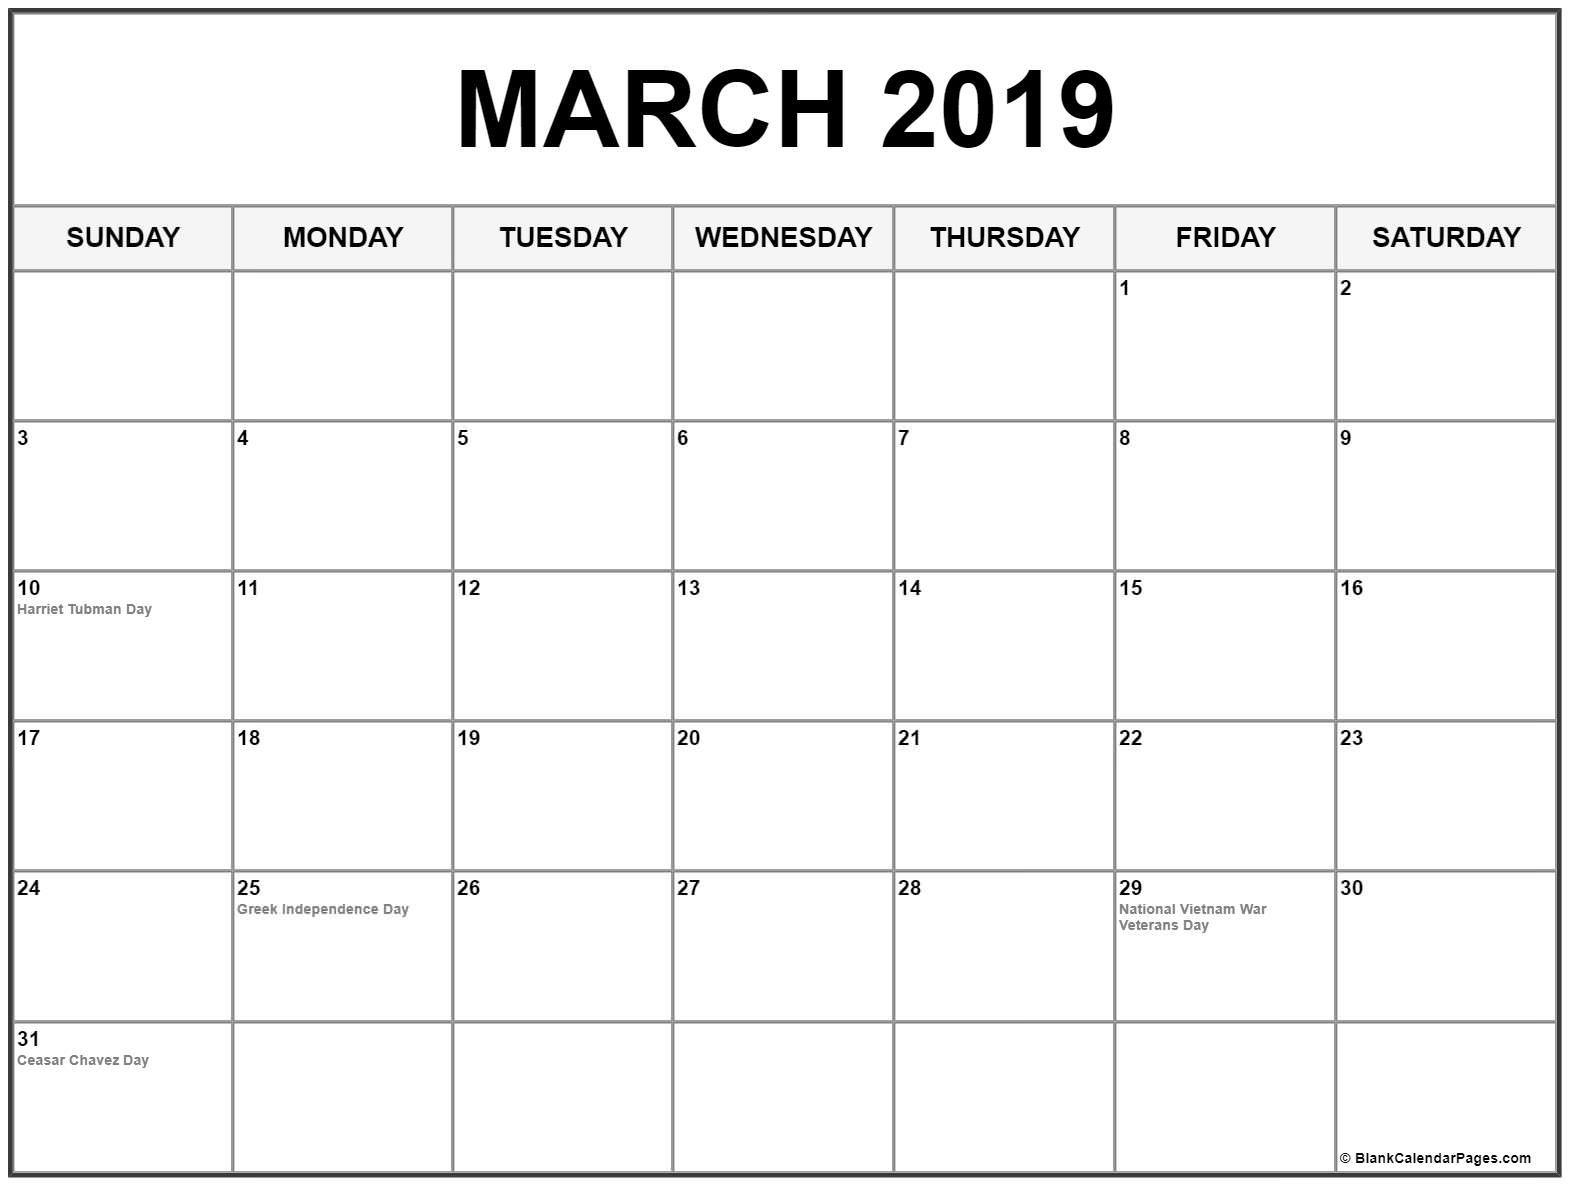 Blank Calendar March 2019 Printable | 250+ March 2019 Calendars with Printable Blank 31 Day Calendar